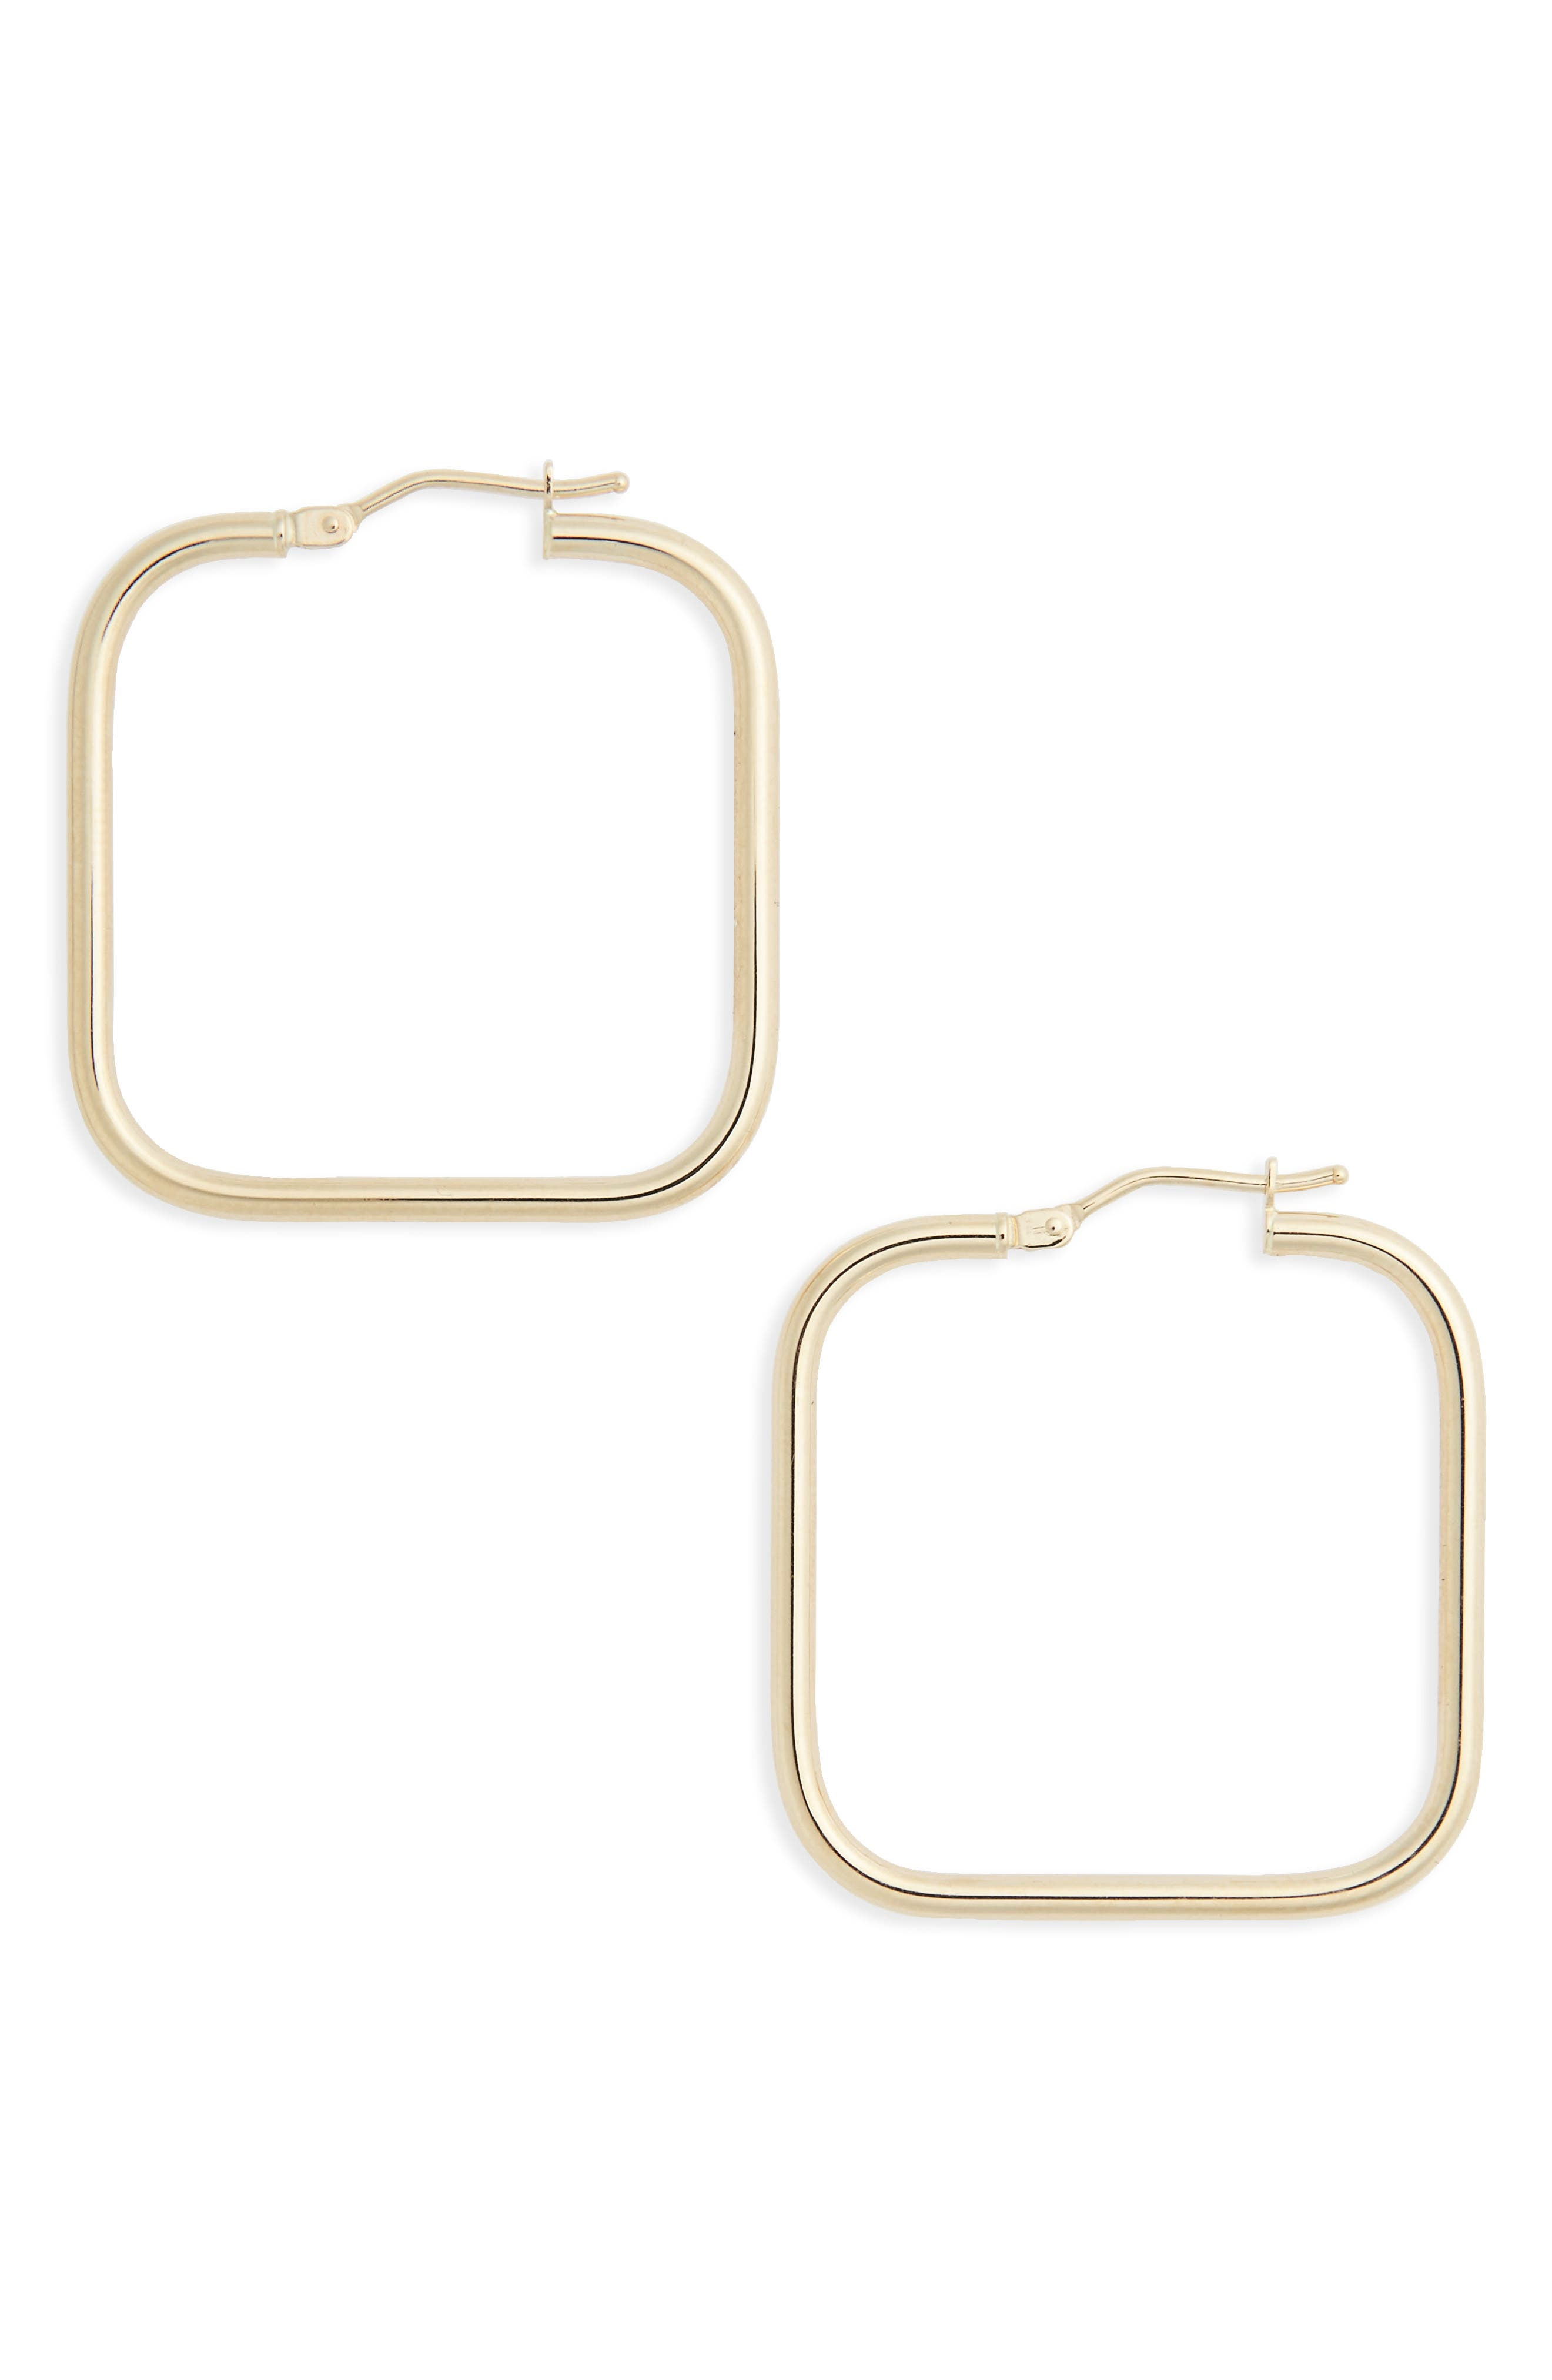 Square Hoop Earrings,                             Main thumbnail 1, color,                             YELLOW GOLD